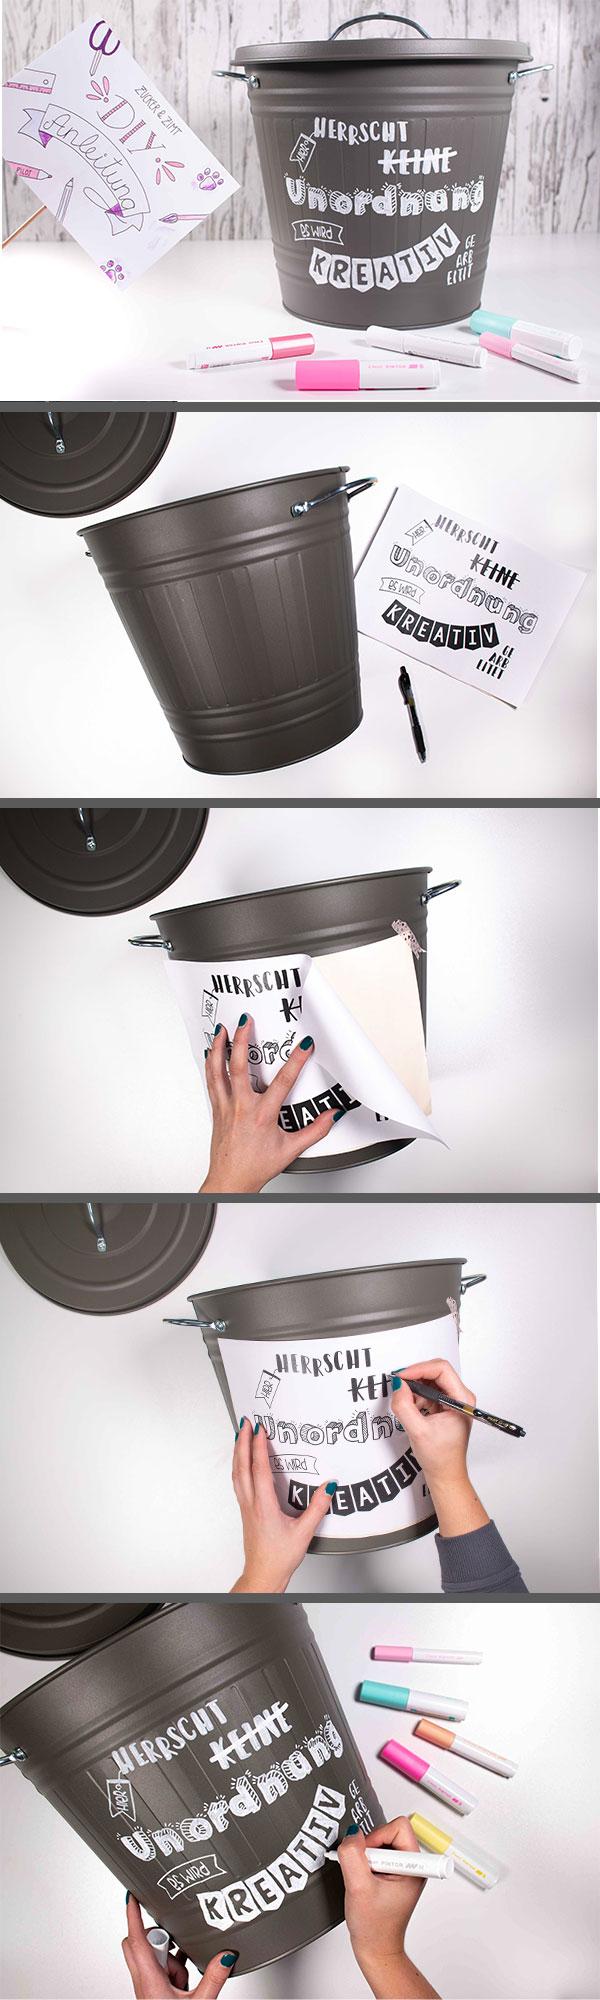 DIY Anleitung Upcyling Mülltonne mit Handlettering